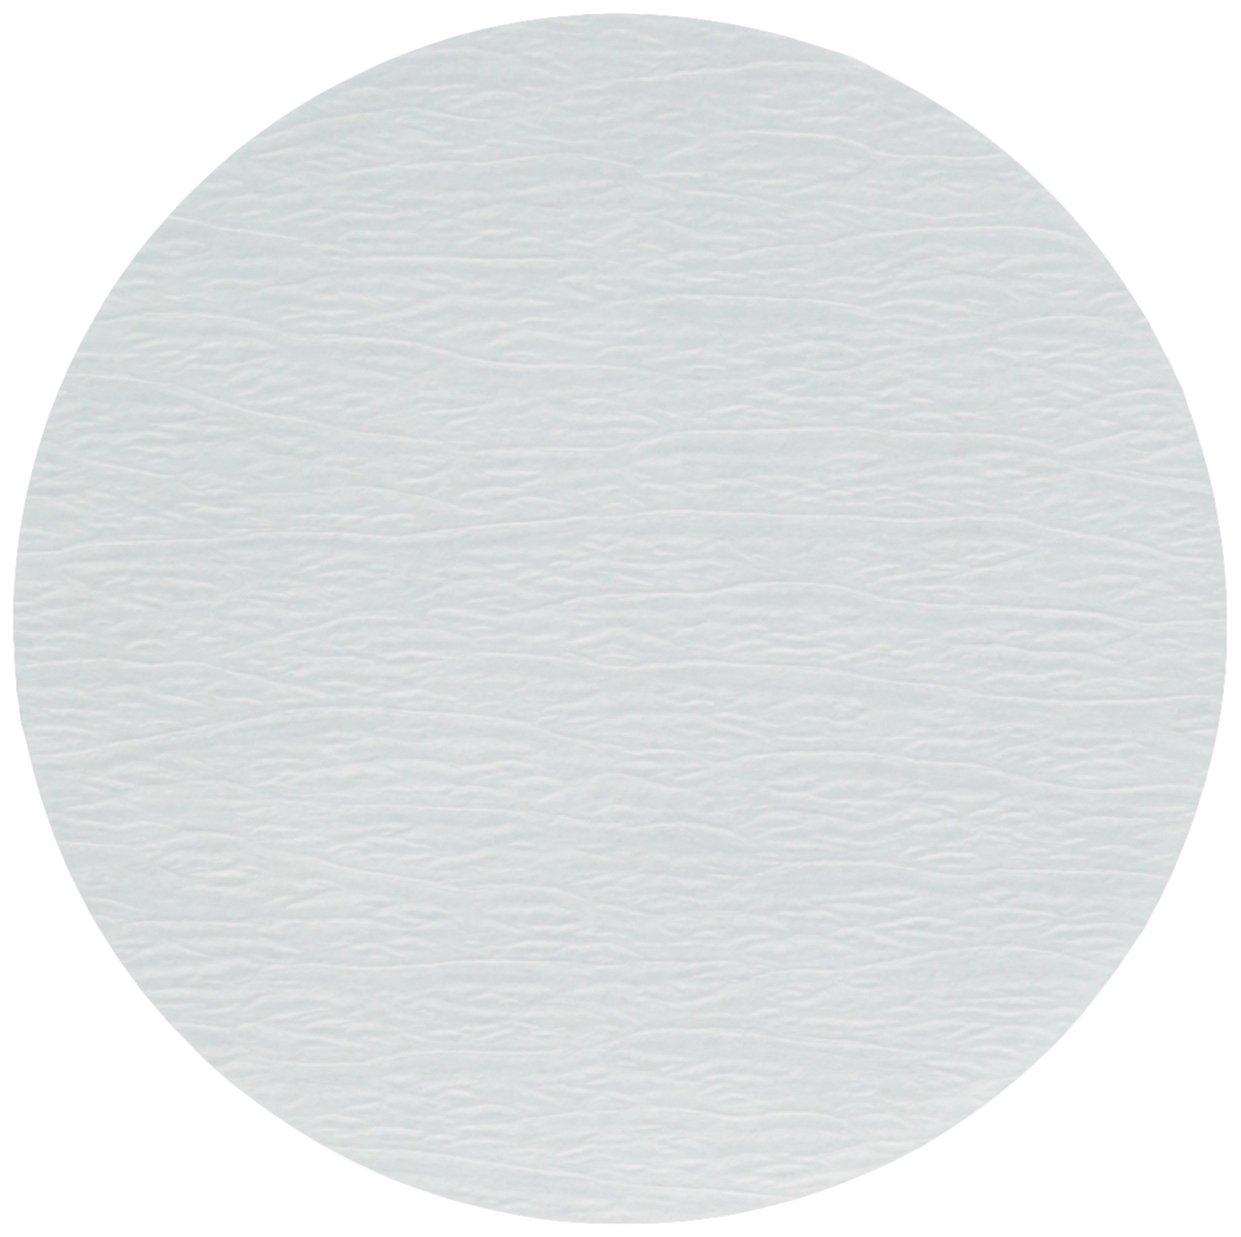 Indefinitely Cytiva Reeve Angel 5202-090 Qualitative Cr Circle Filter Nashville-Davidson Mall Paper